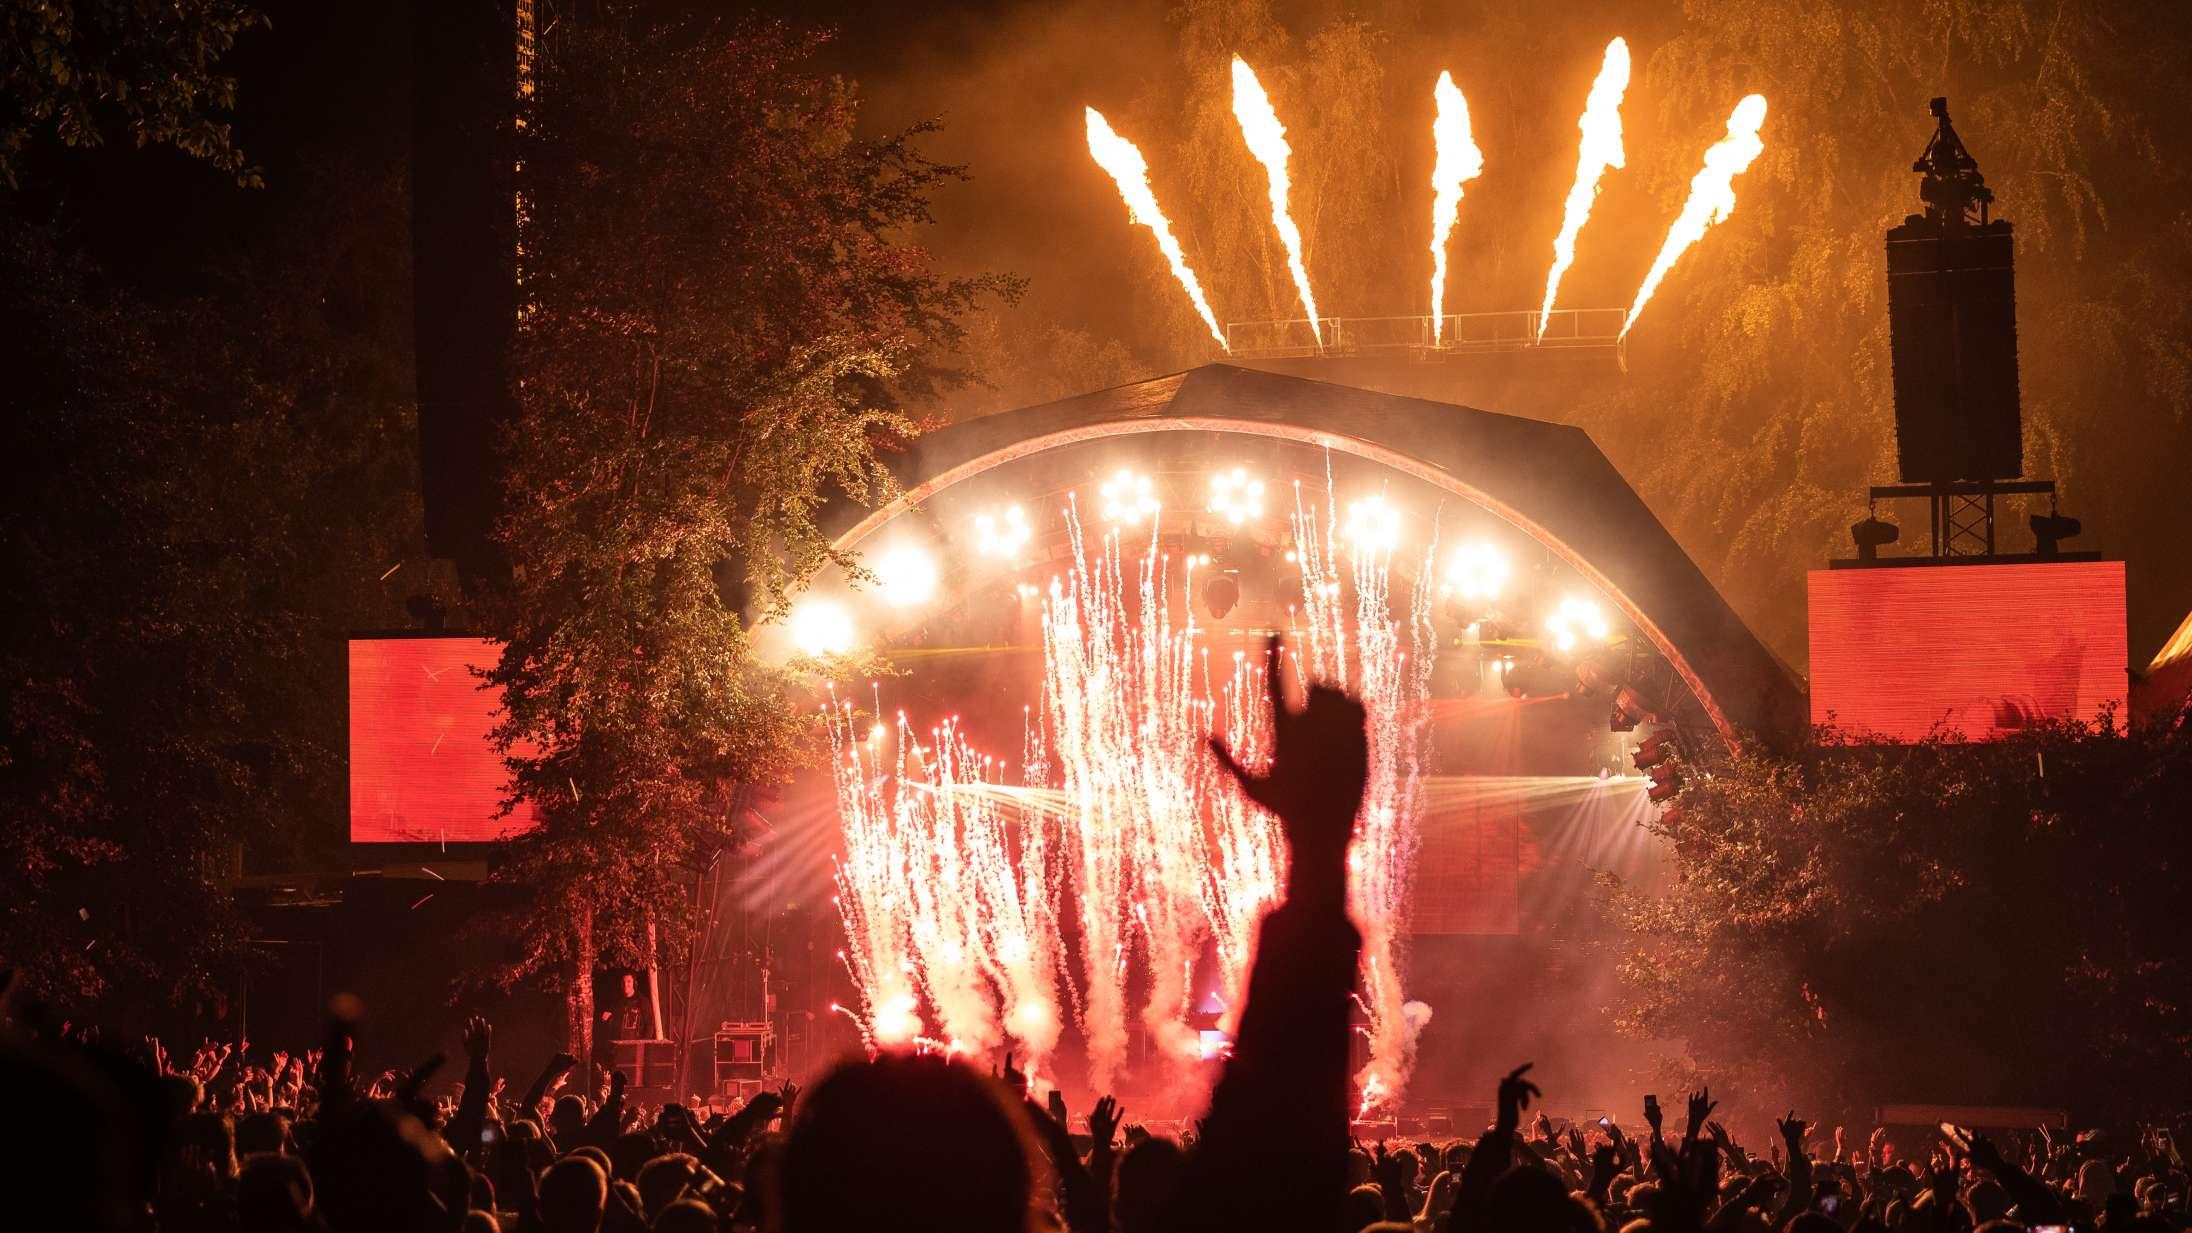 Smukfest har (få) billetter til salg til 2021 – se her, hvordan du kommer med